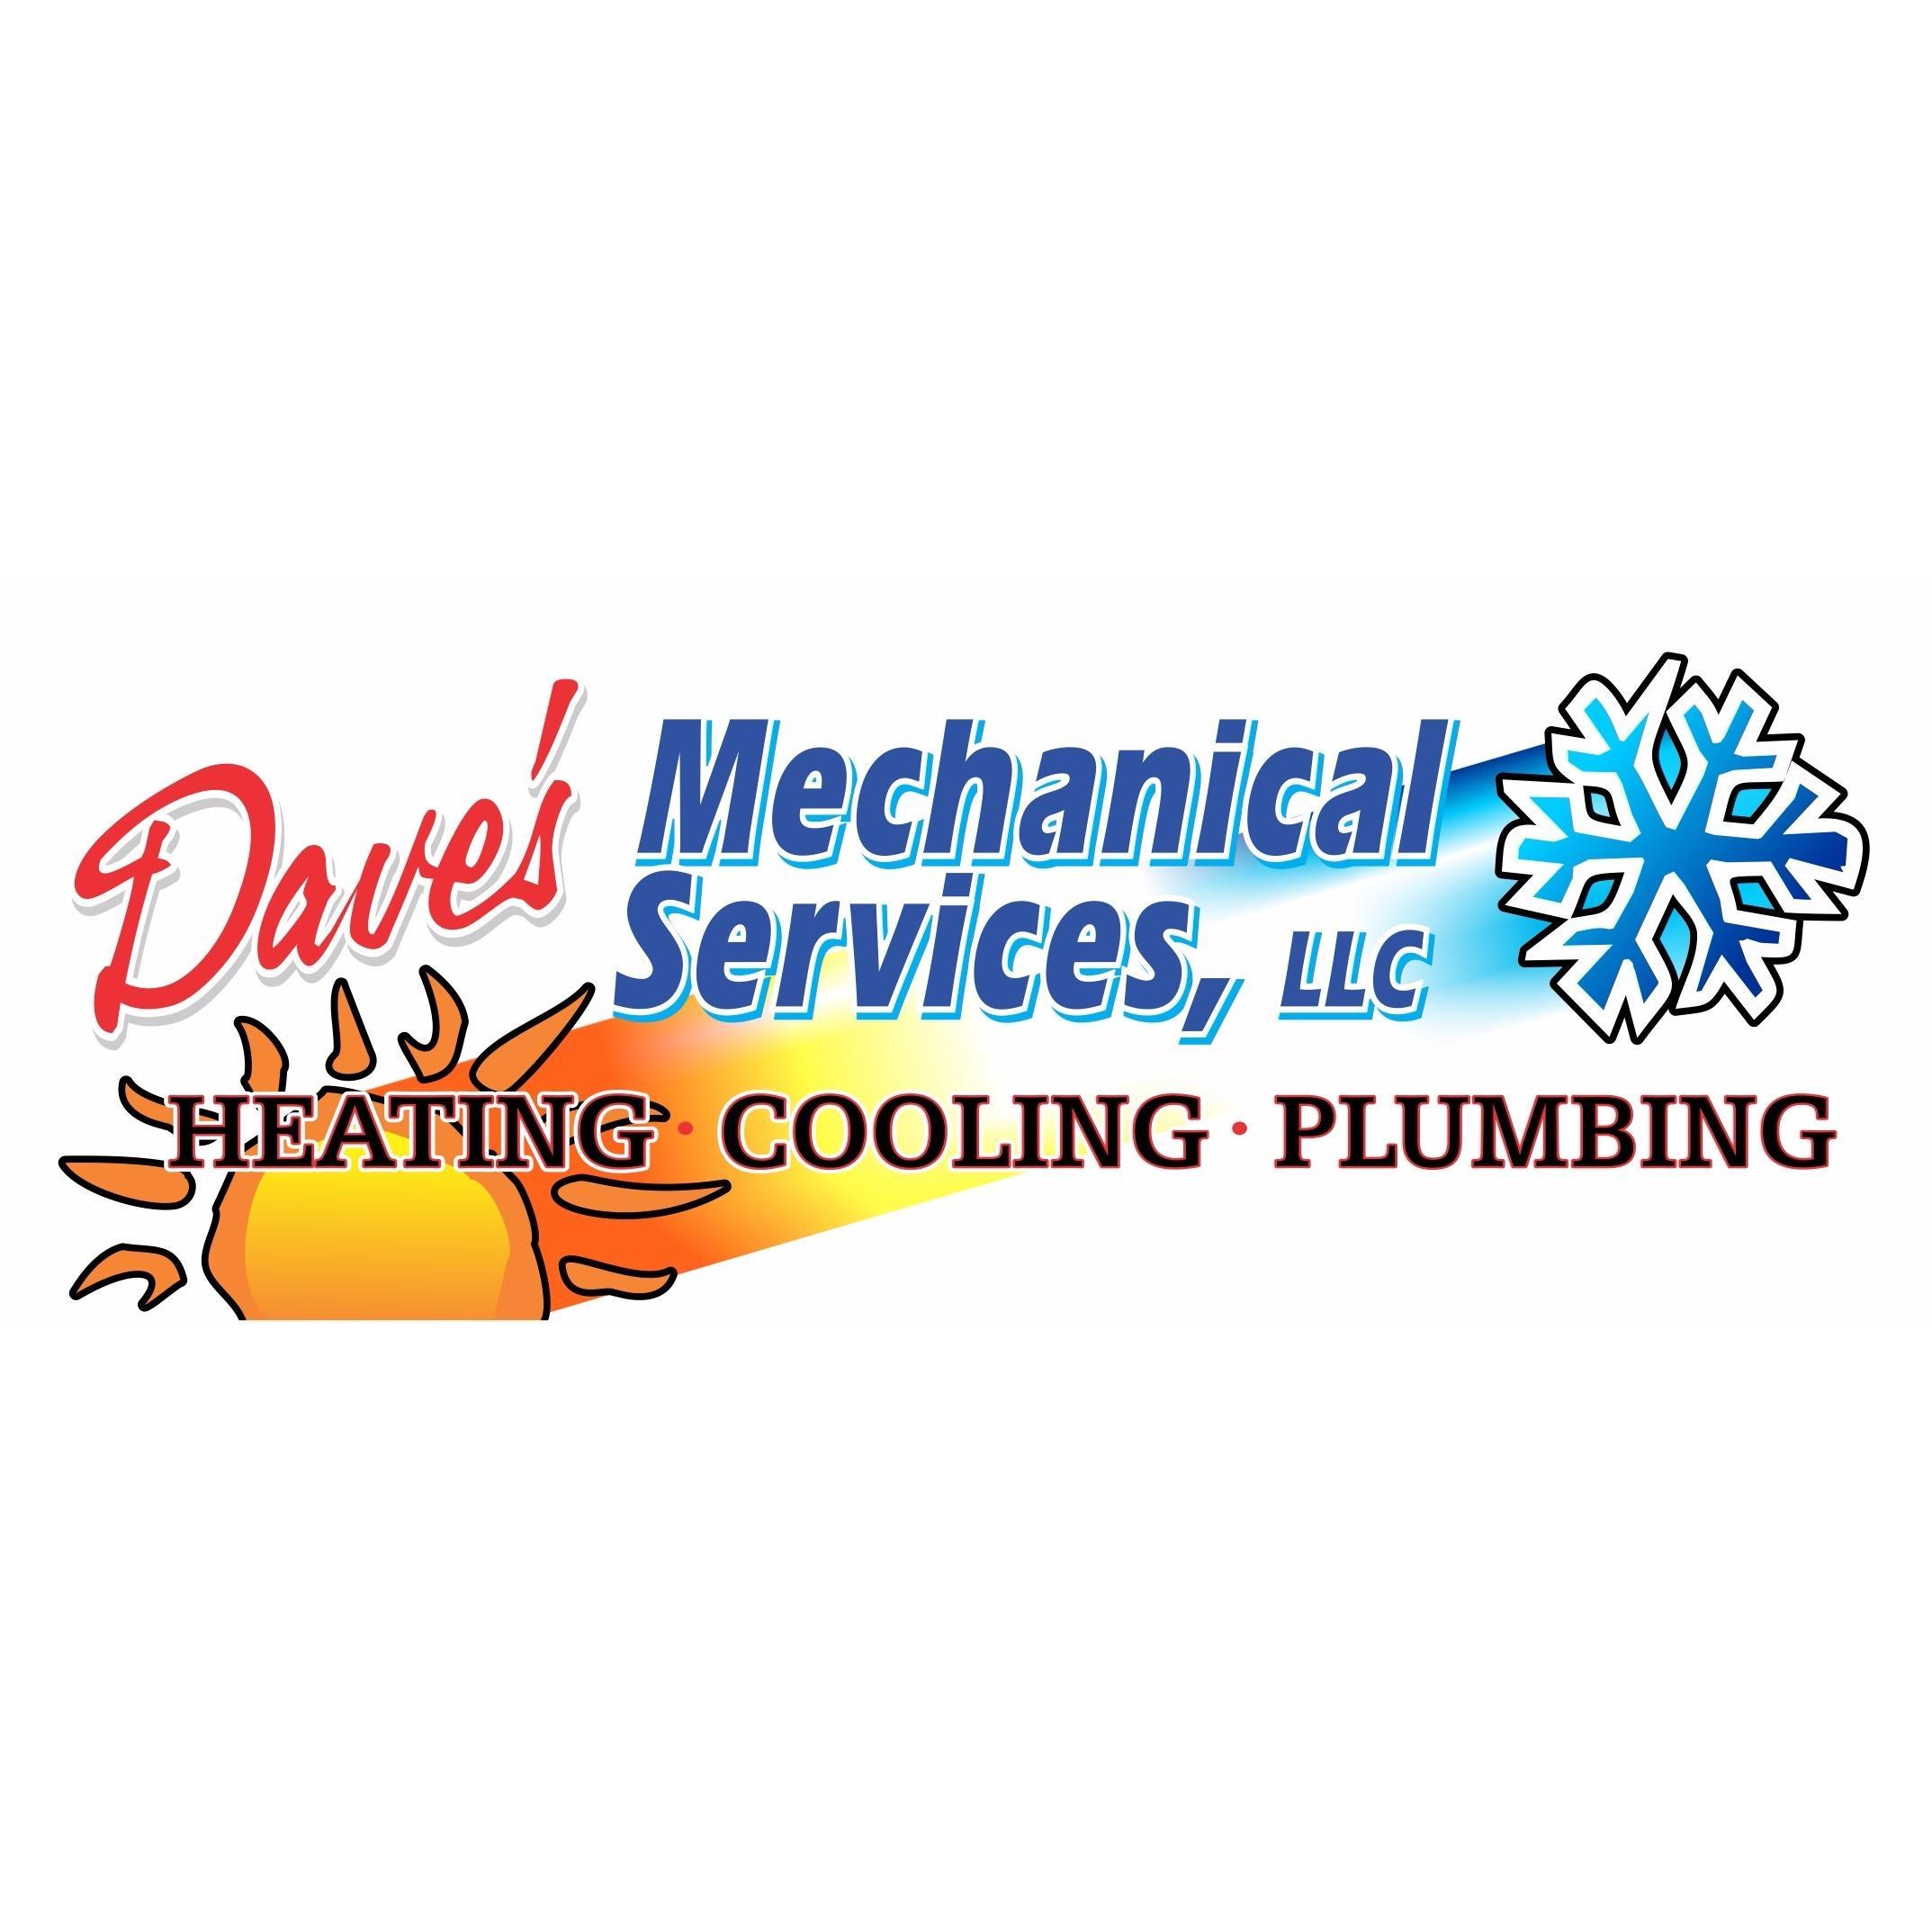 Dave's Mechanical Services, LLC